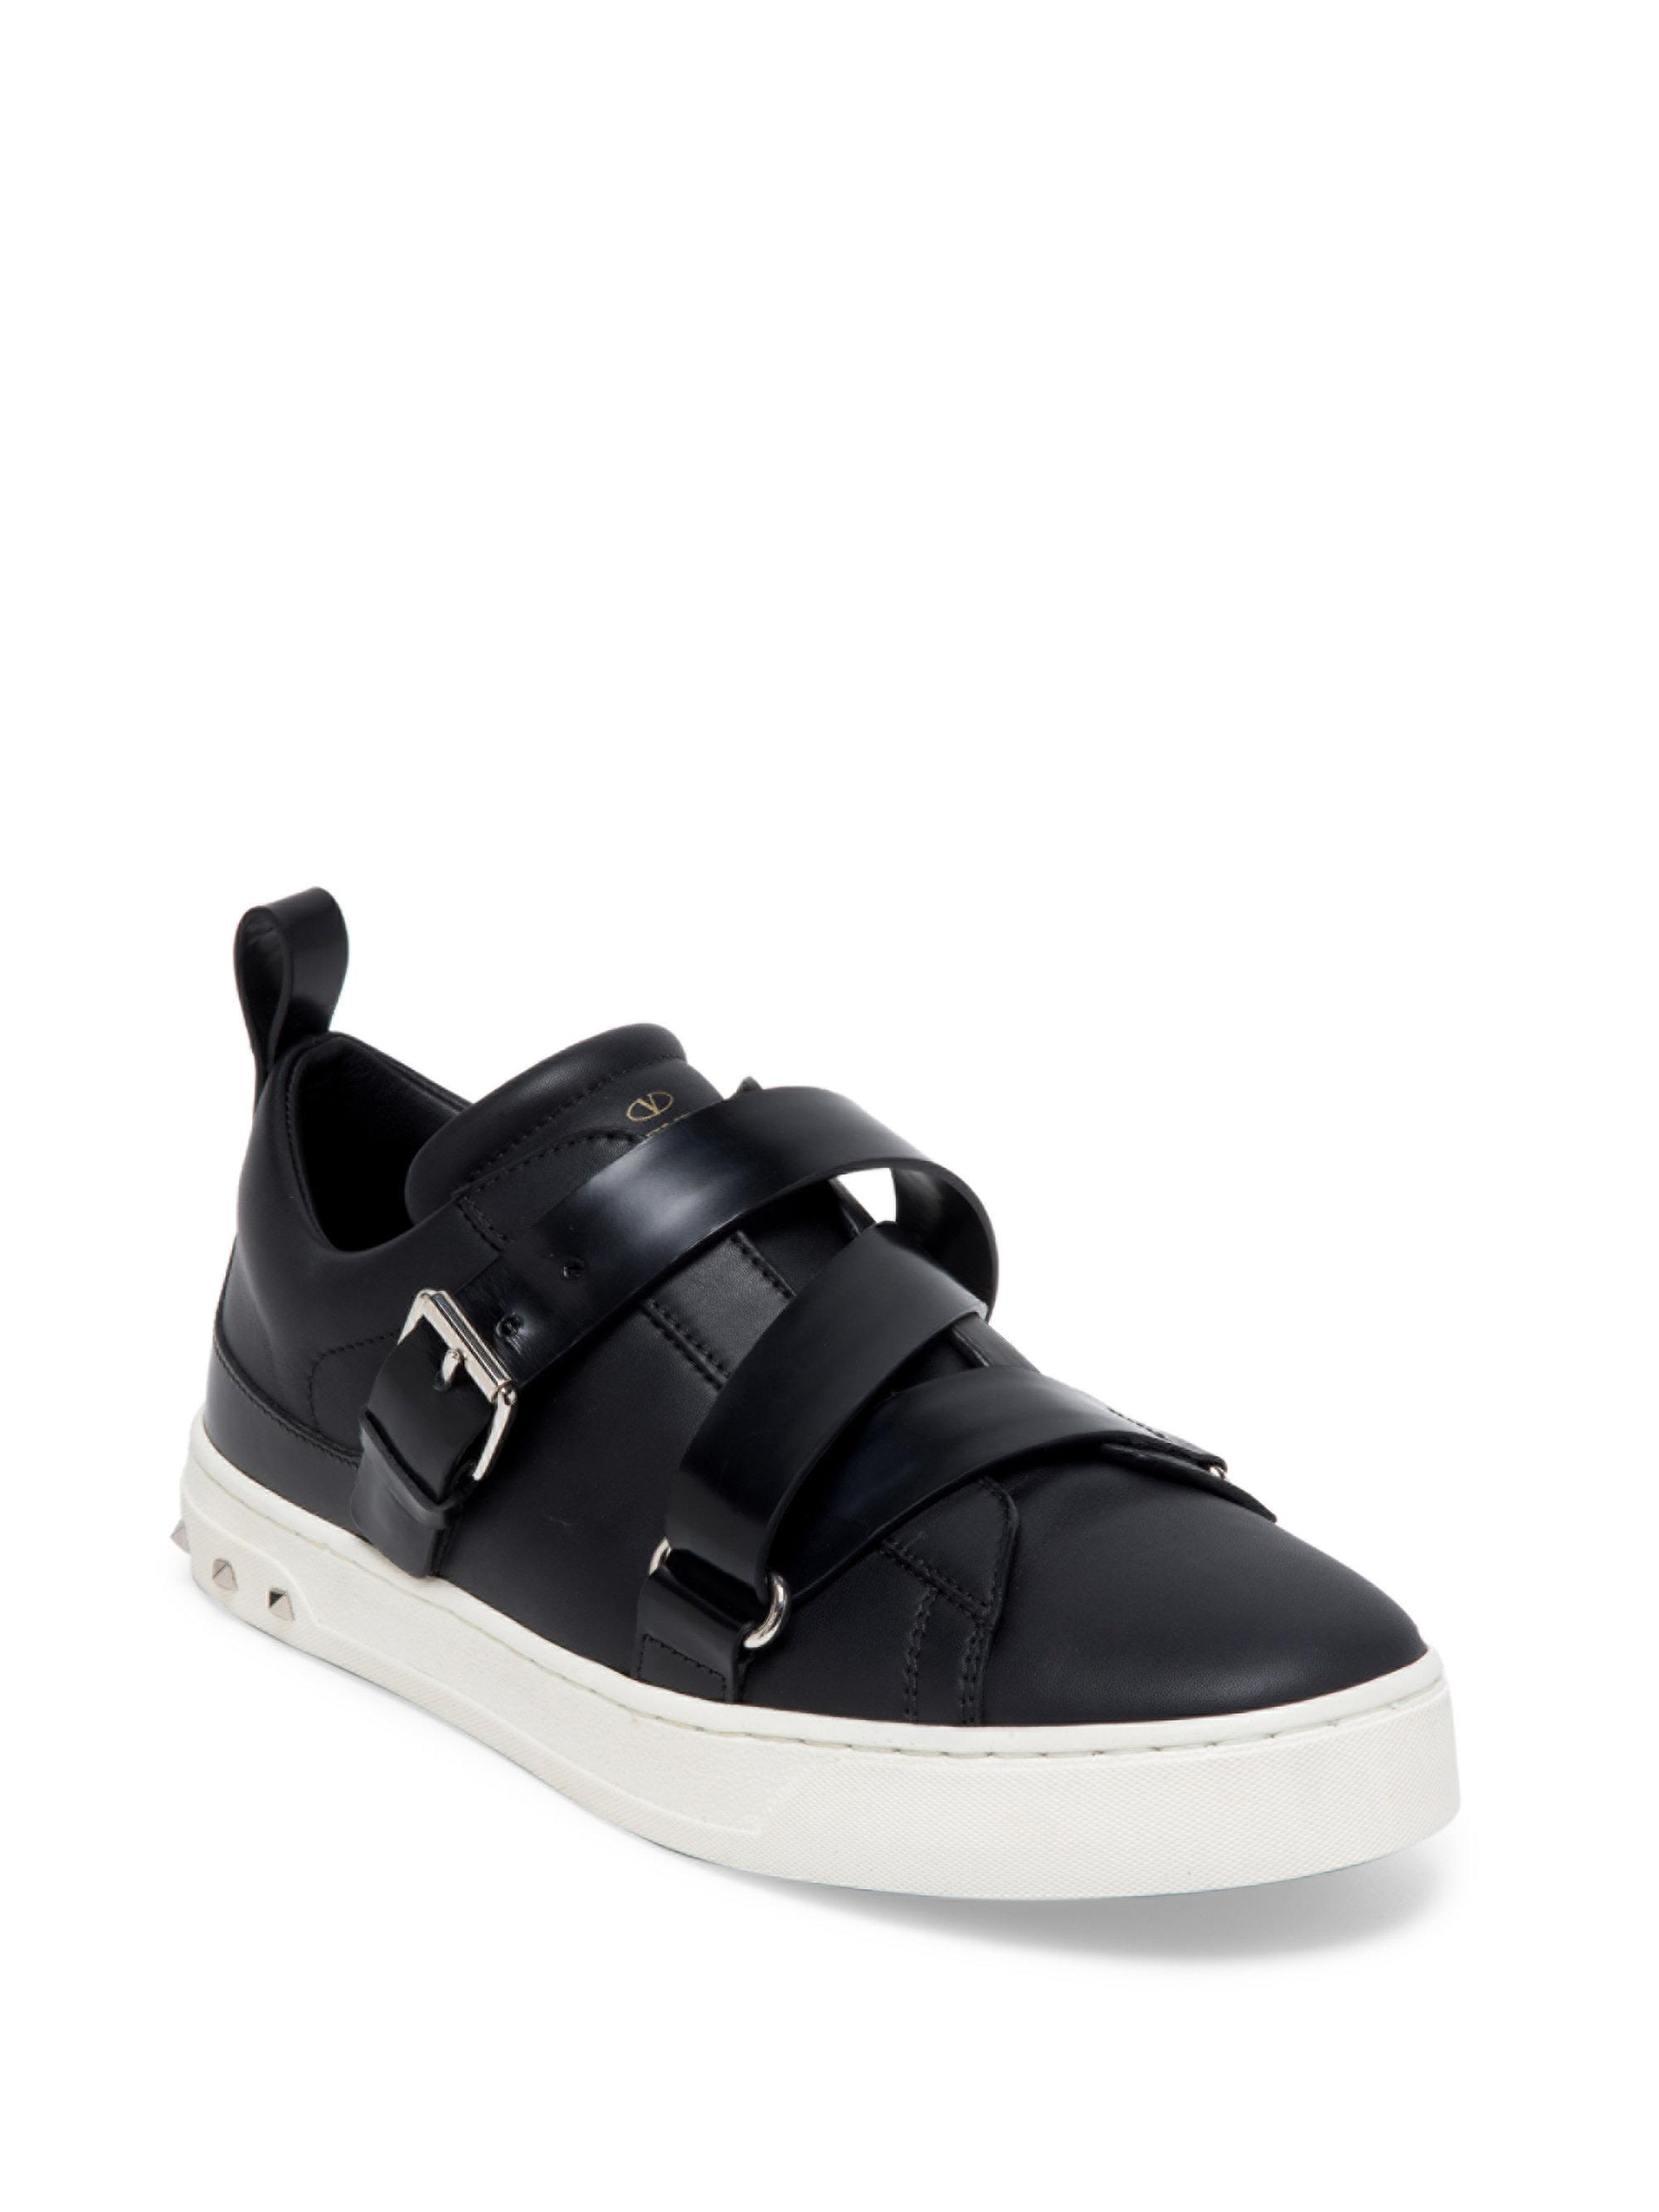 valentino v punk sneakers \u003e Up to 74